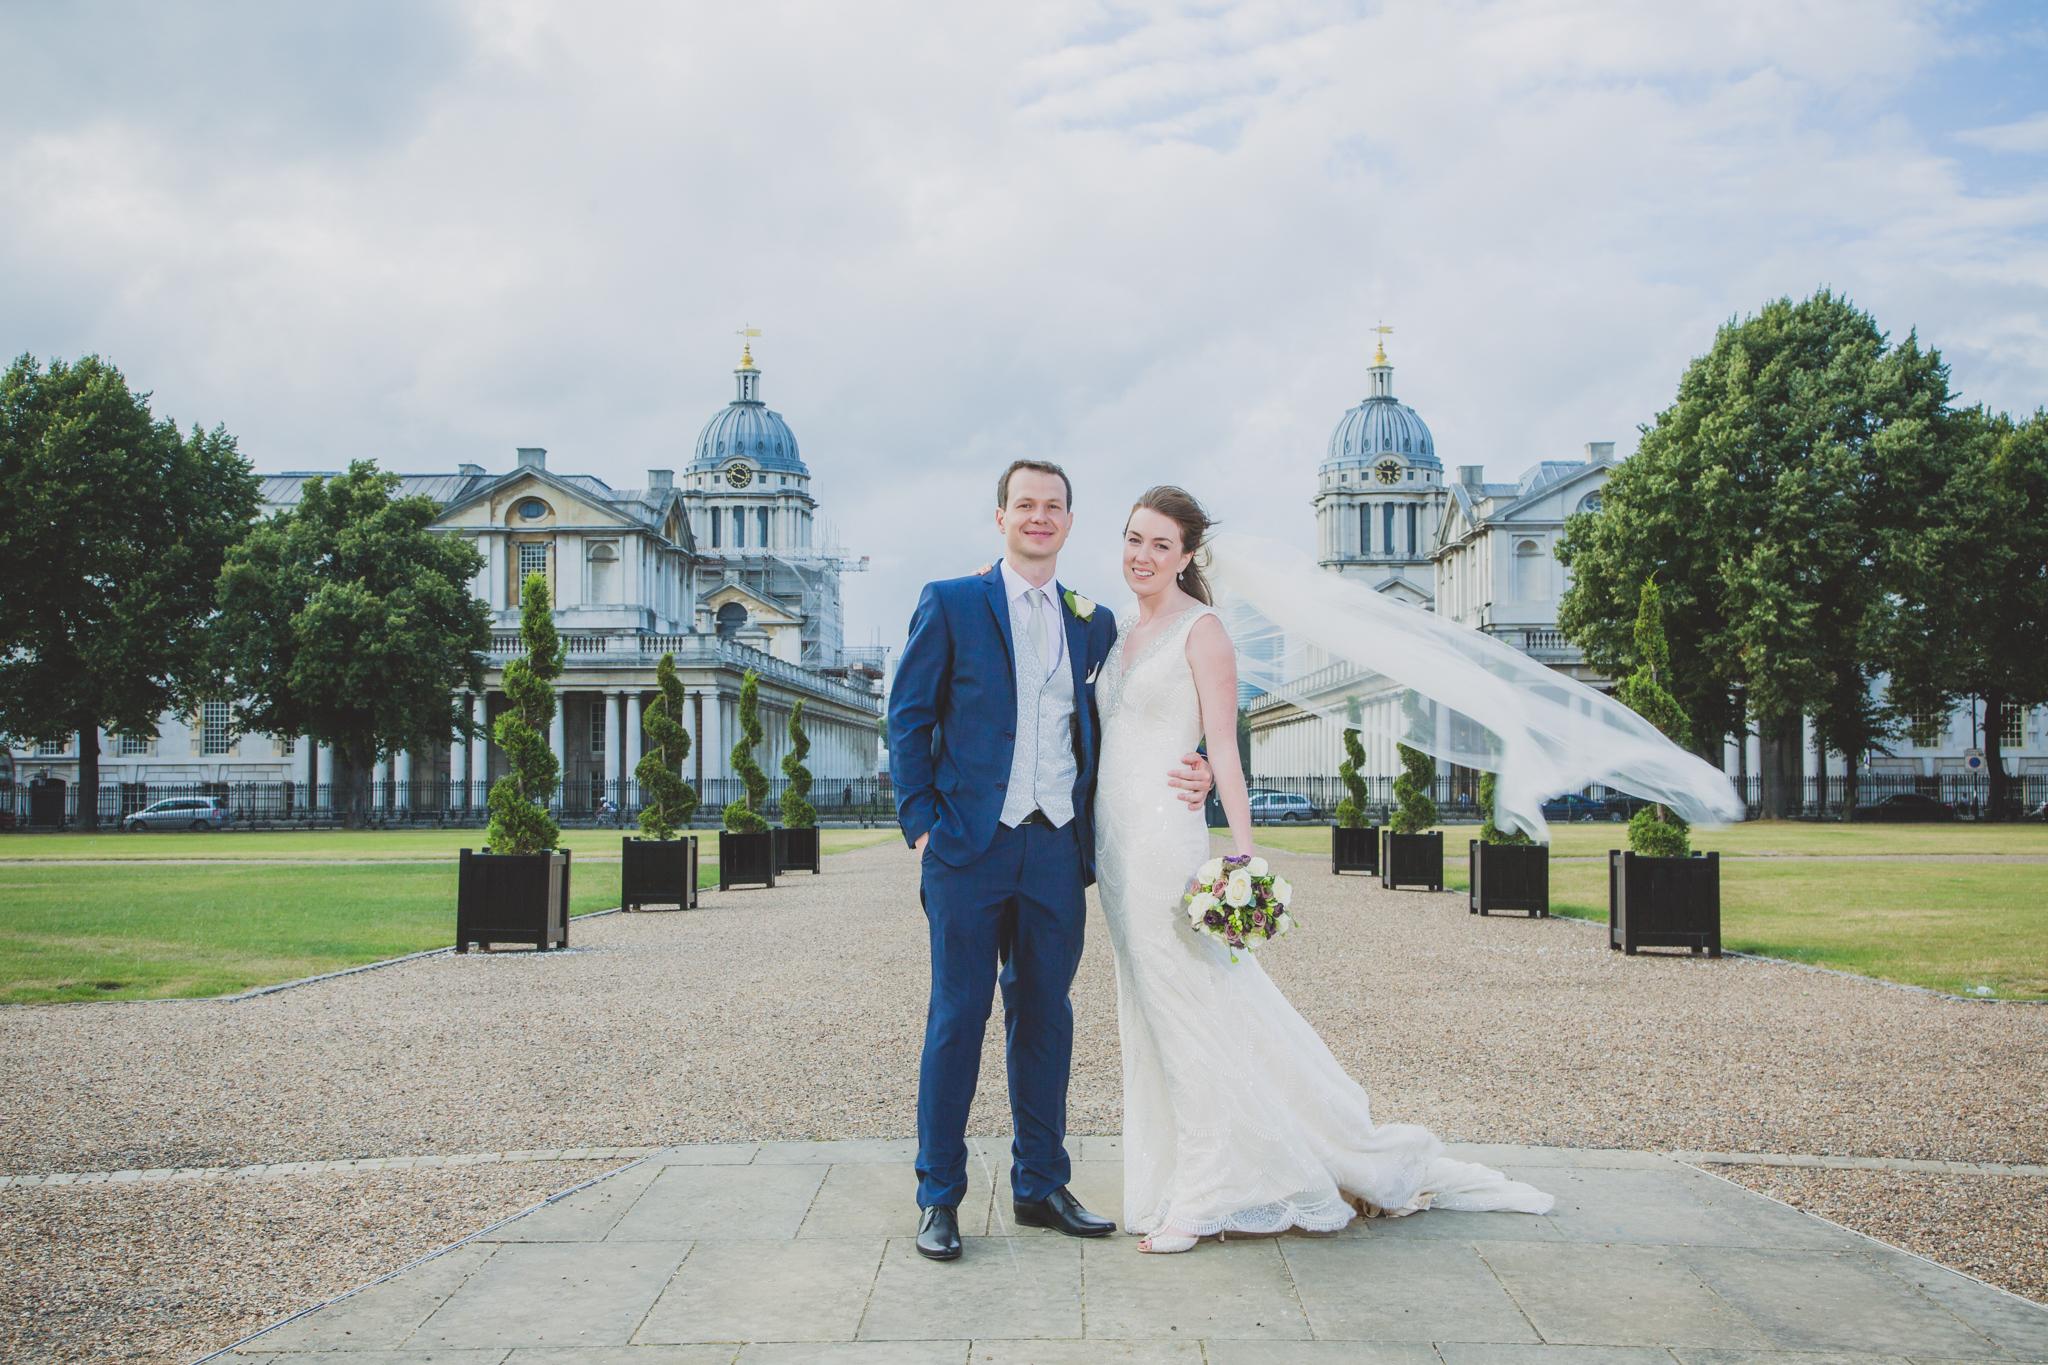 St. Alfege Chuch: Poppy & Alex Wedding Photoshoot